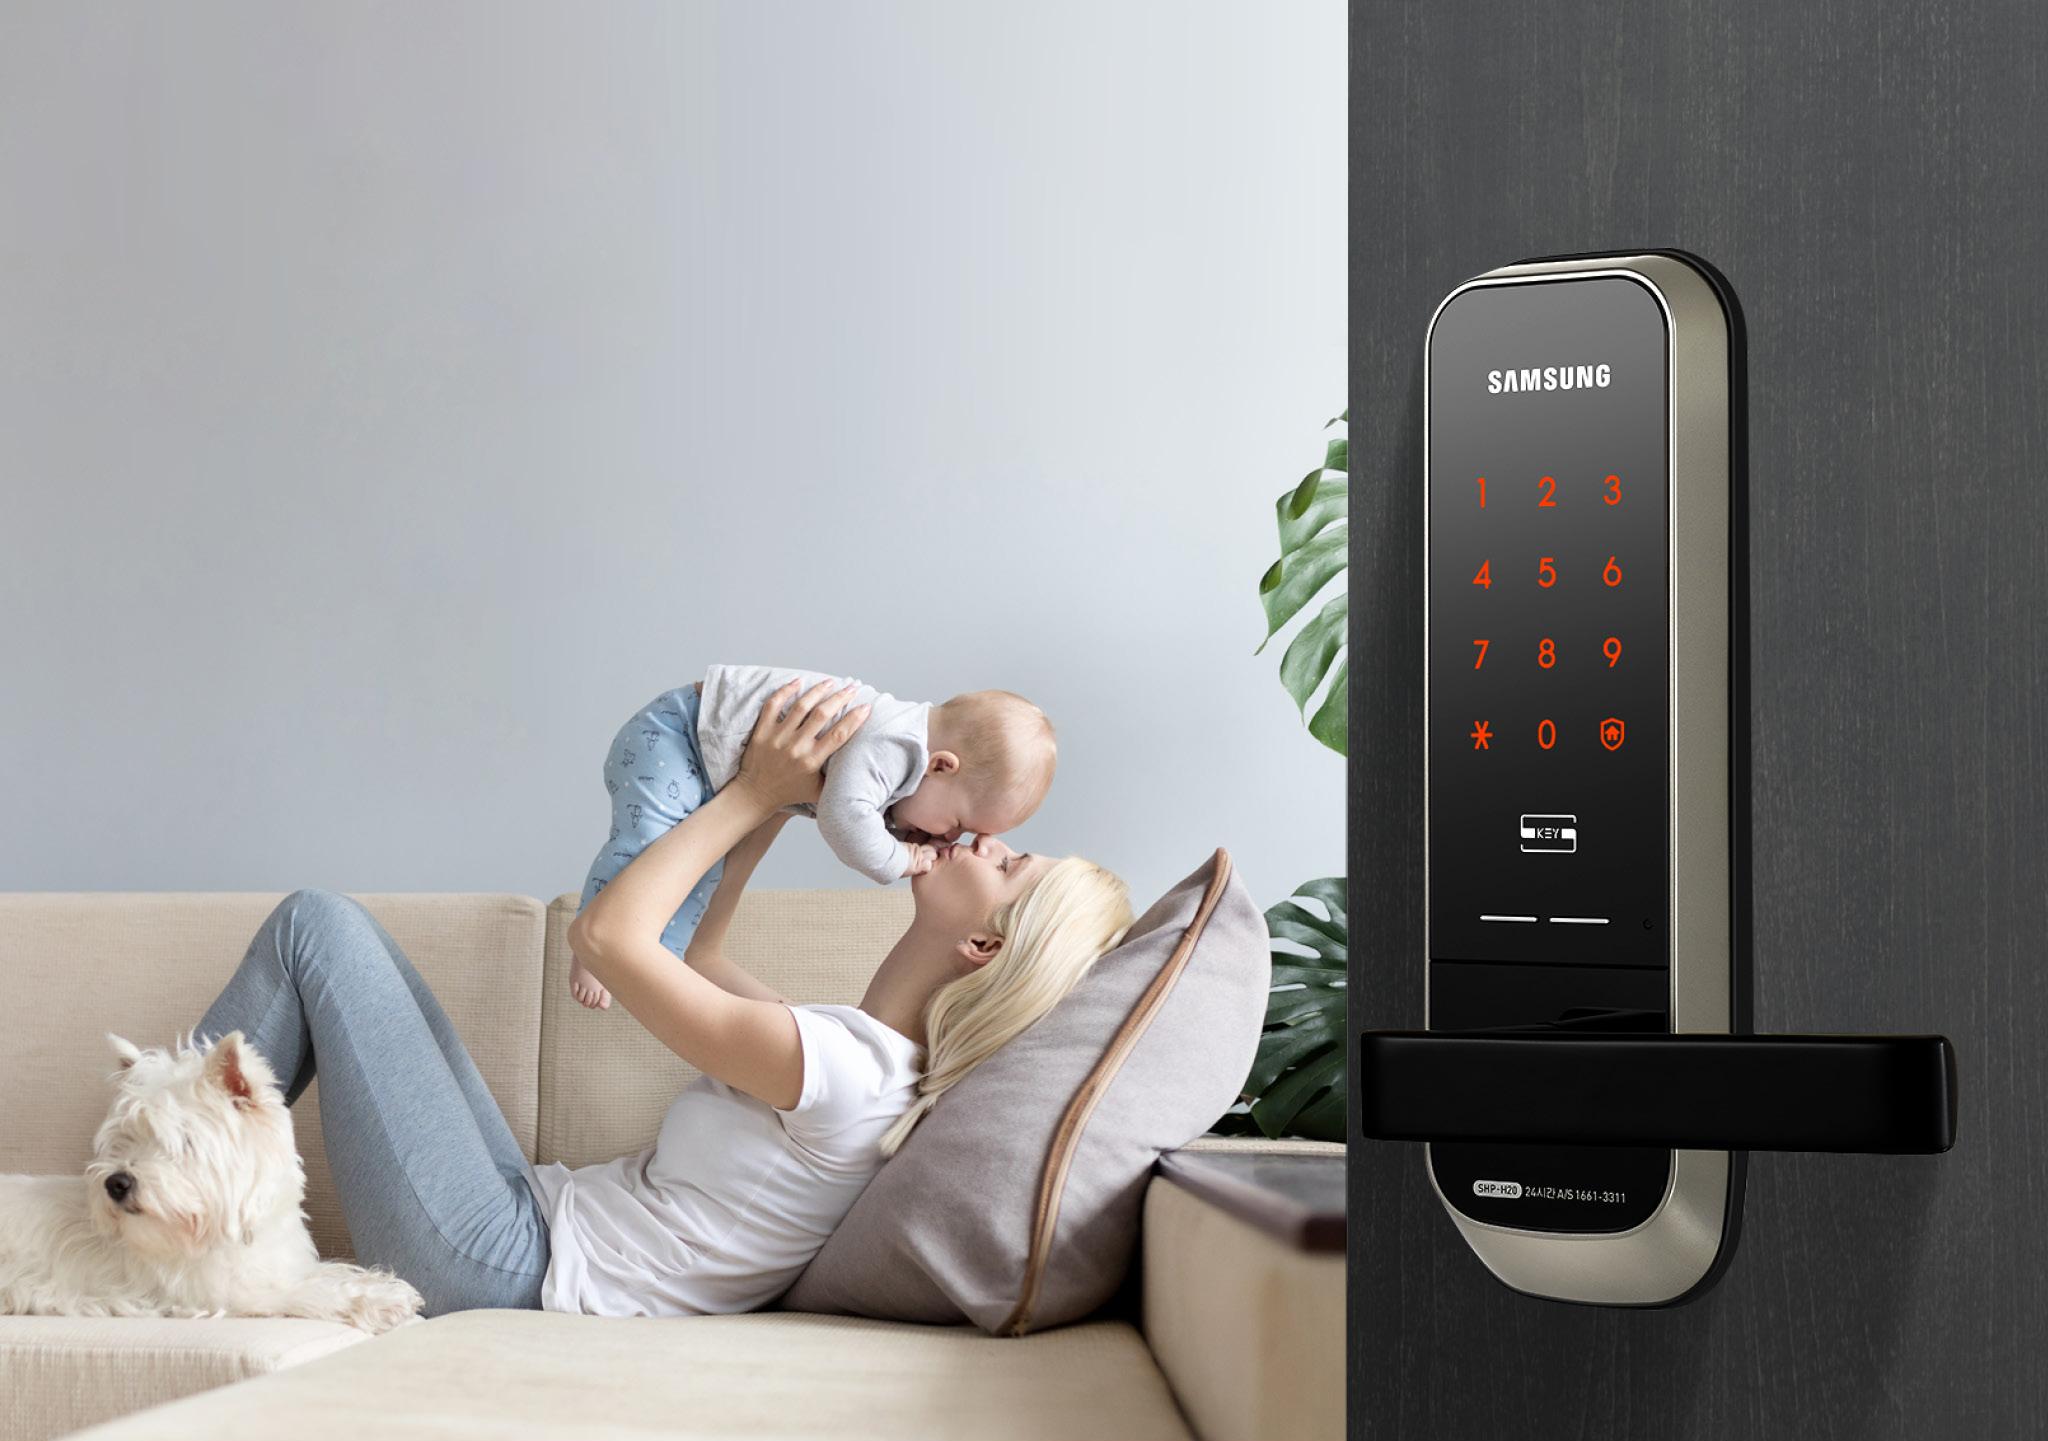 Samsung smart doorlock รุ่น SHP-H20 กลอนประตูดิจิตอล digital door lock รหัส+บัตร Best sell